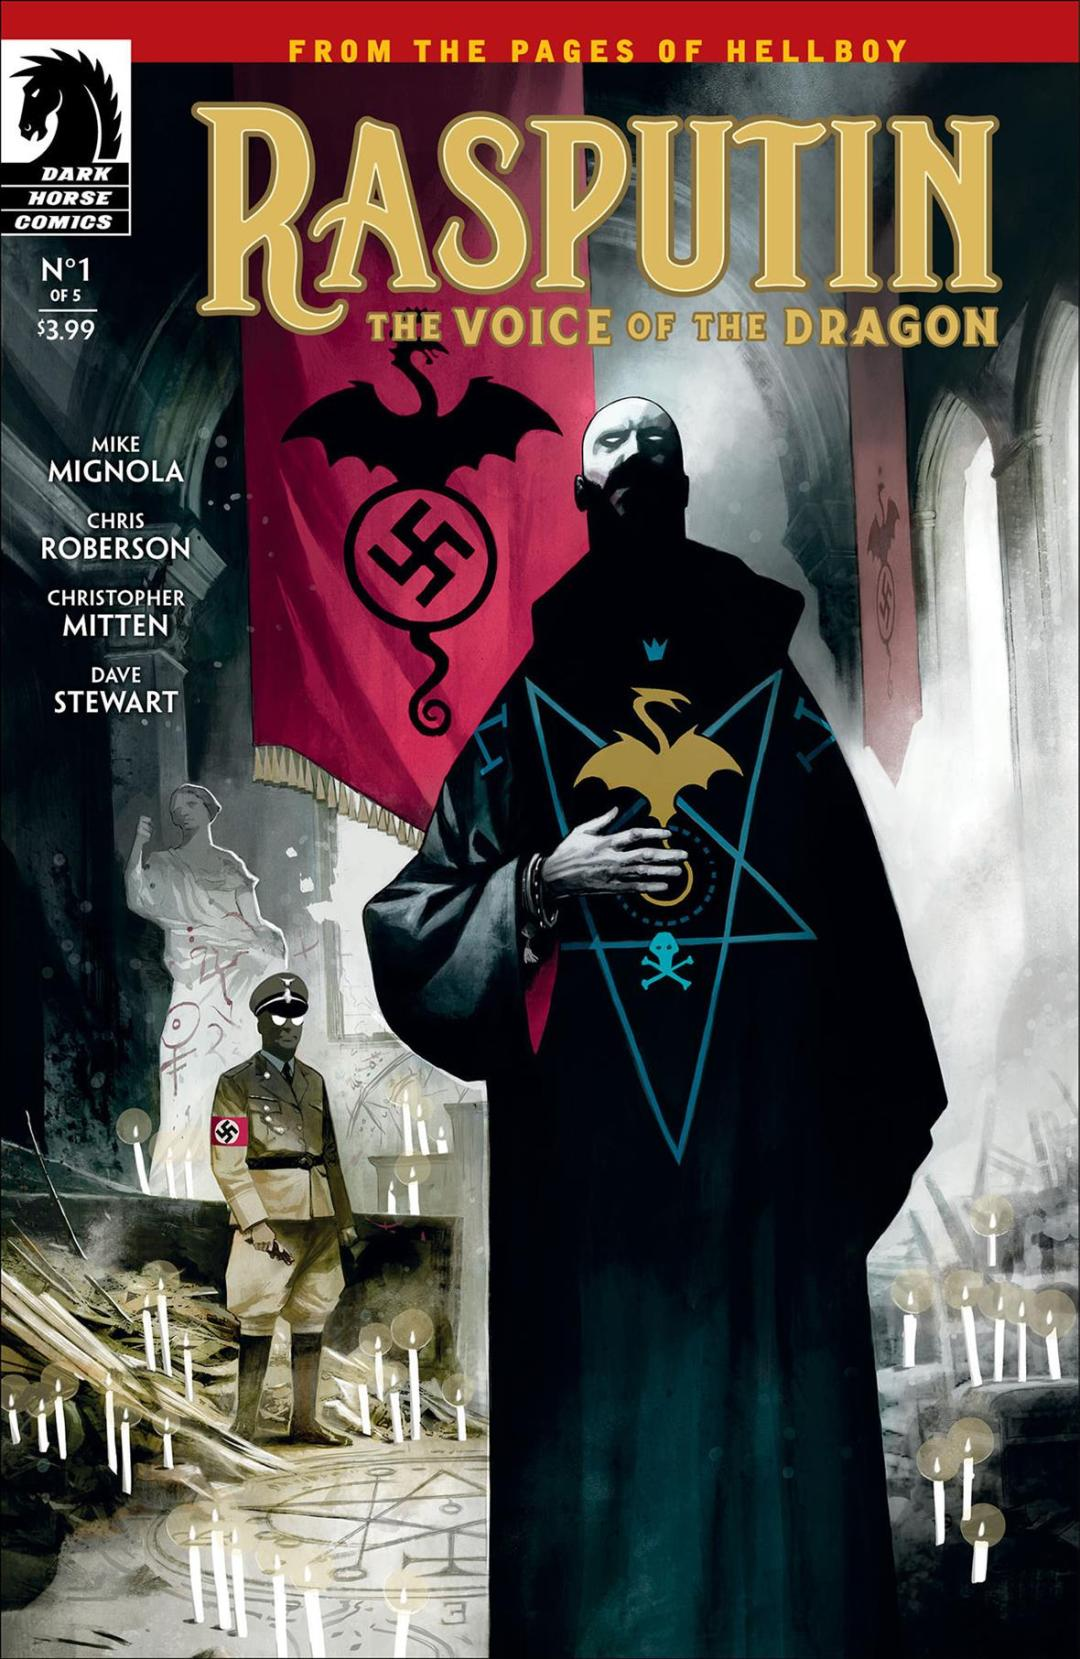 Dark Horse Comics Previews 'Rasputin: The Voice of the Dragon'